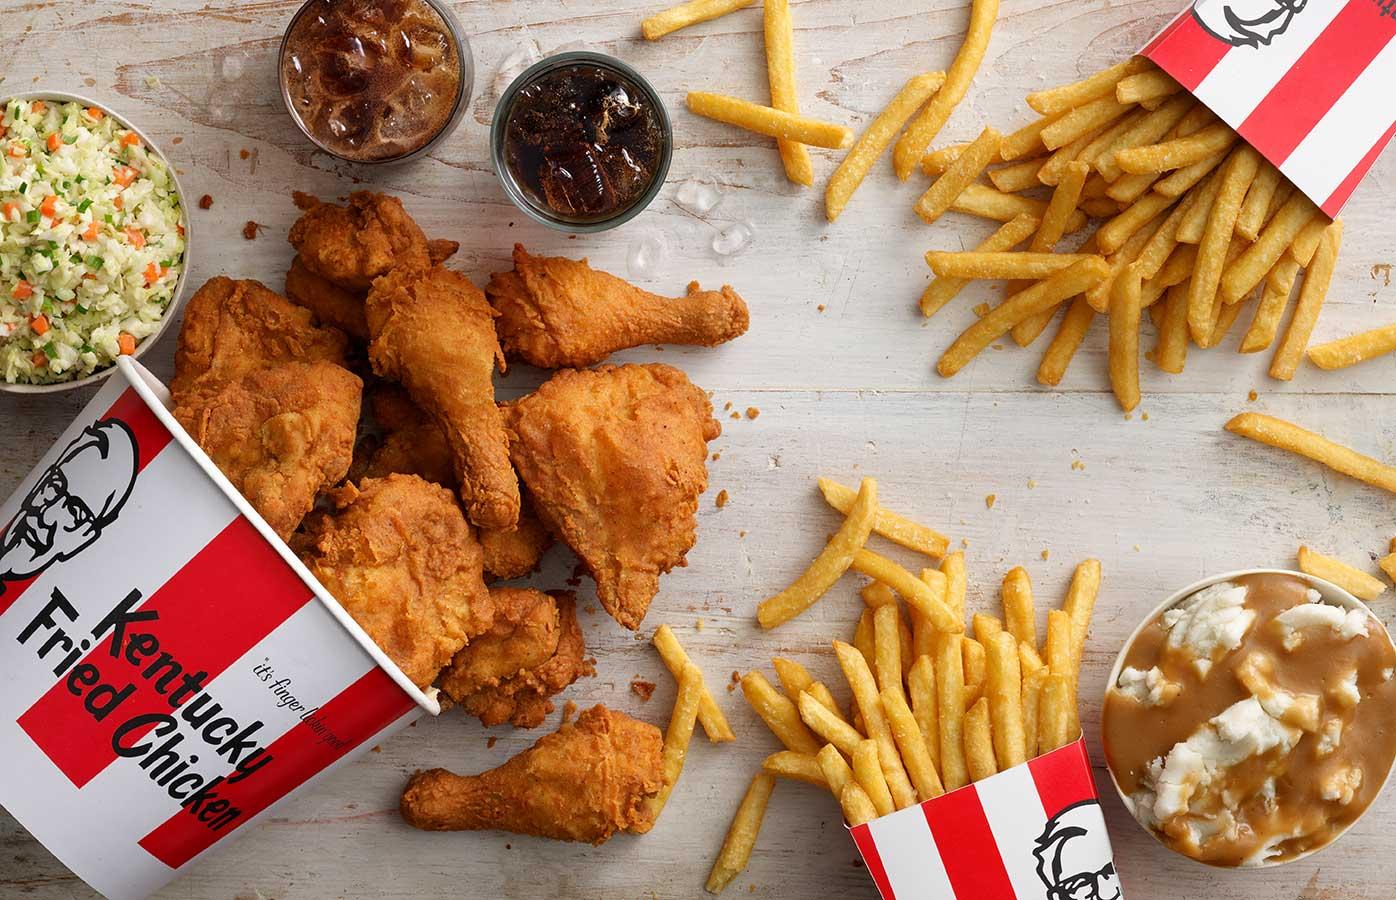 KFC Family Feast bucket meal